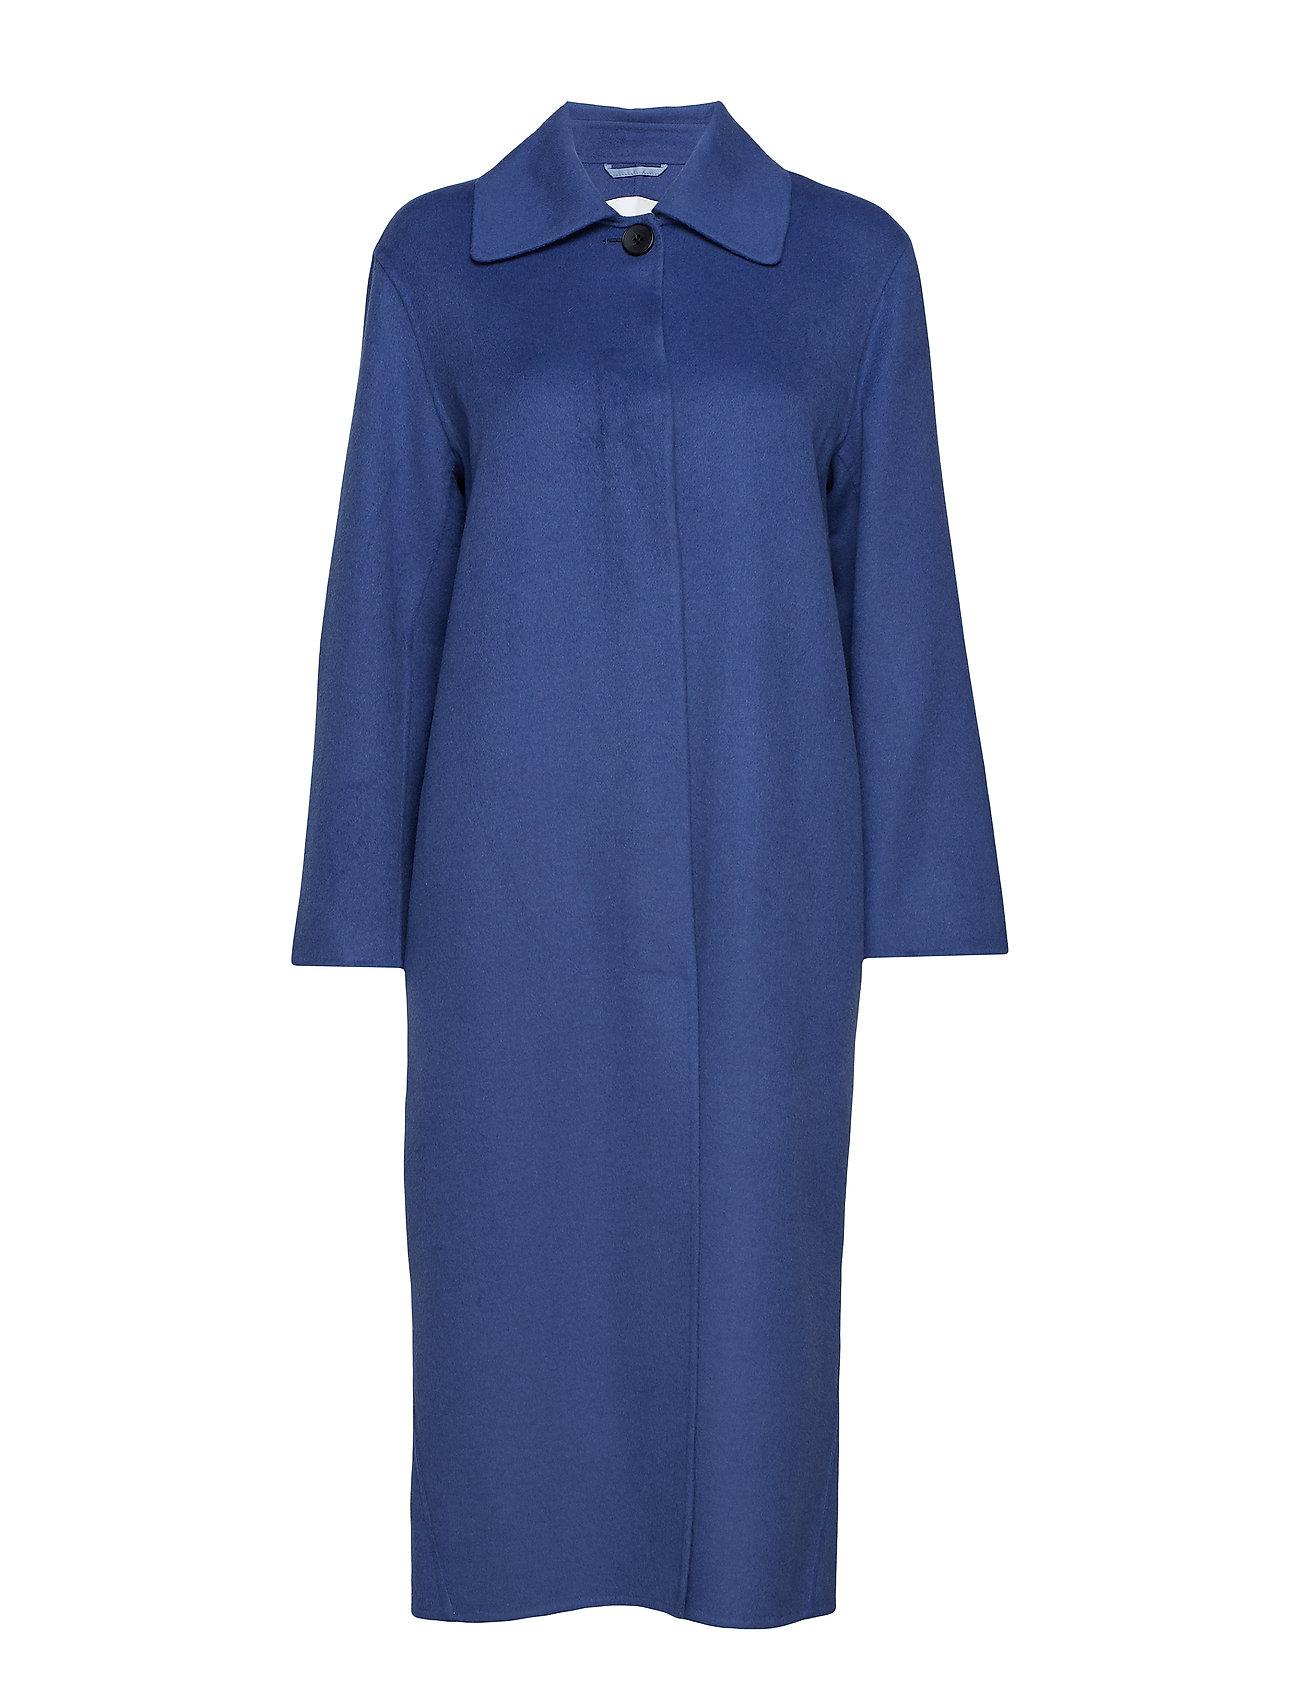 BOSS Business Wear Conami - BRIGHT BLUE